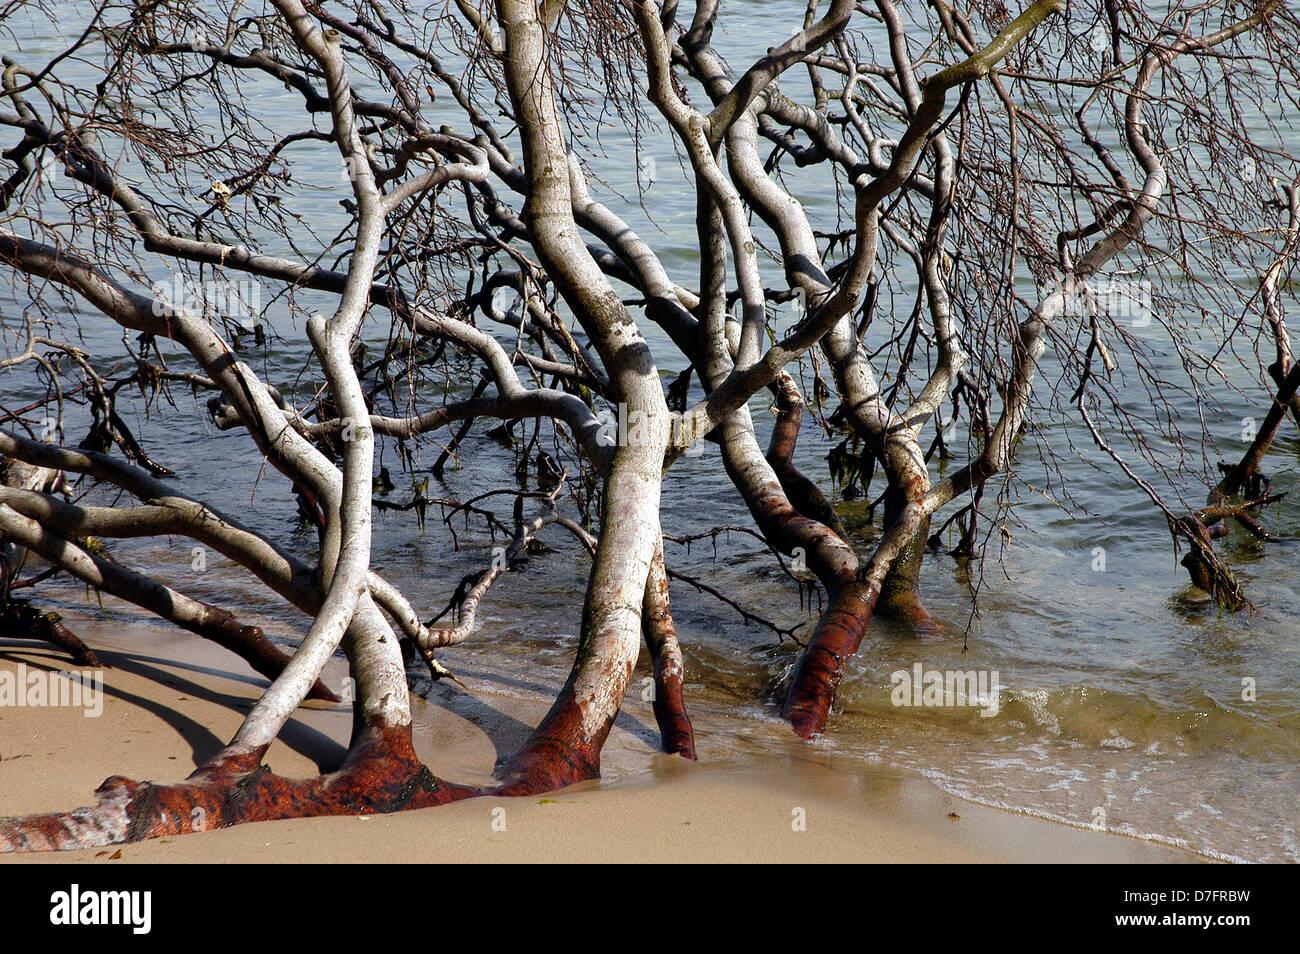 Germany, Island of Ruegen, tree in the water - Stock Image